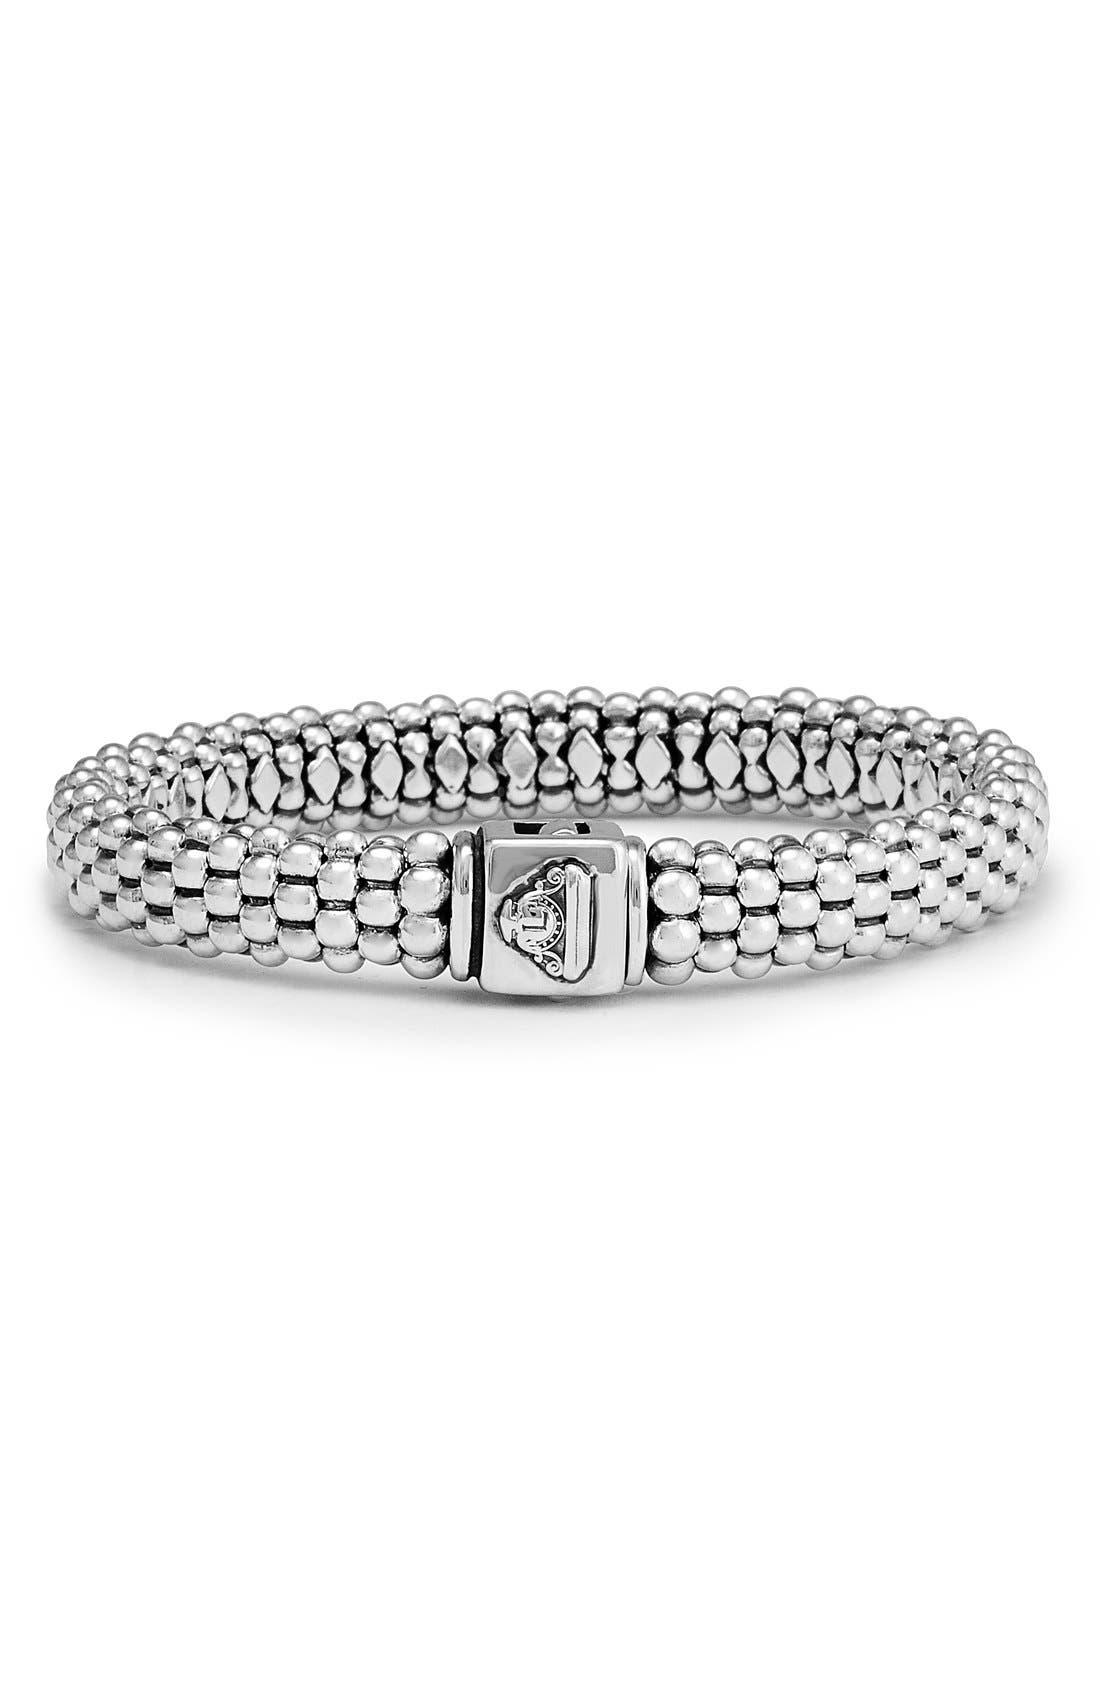 Caviar Rope Bracelet,                             Alternate thumbnail 4, color,                             SILVER